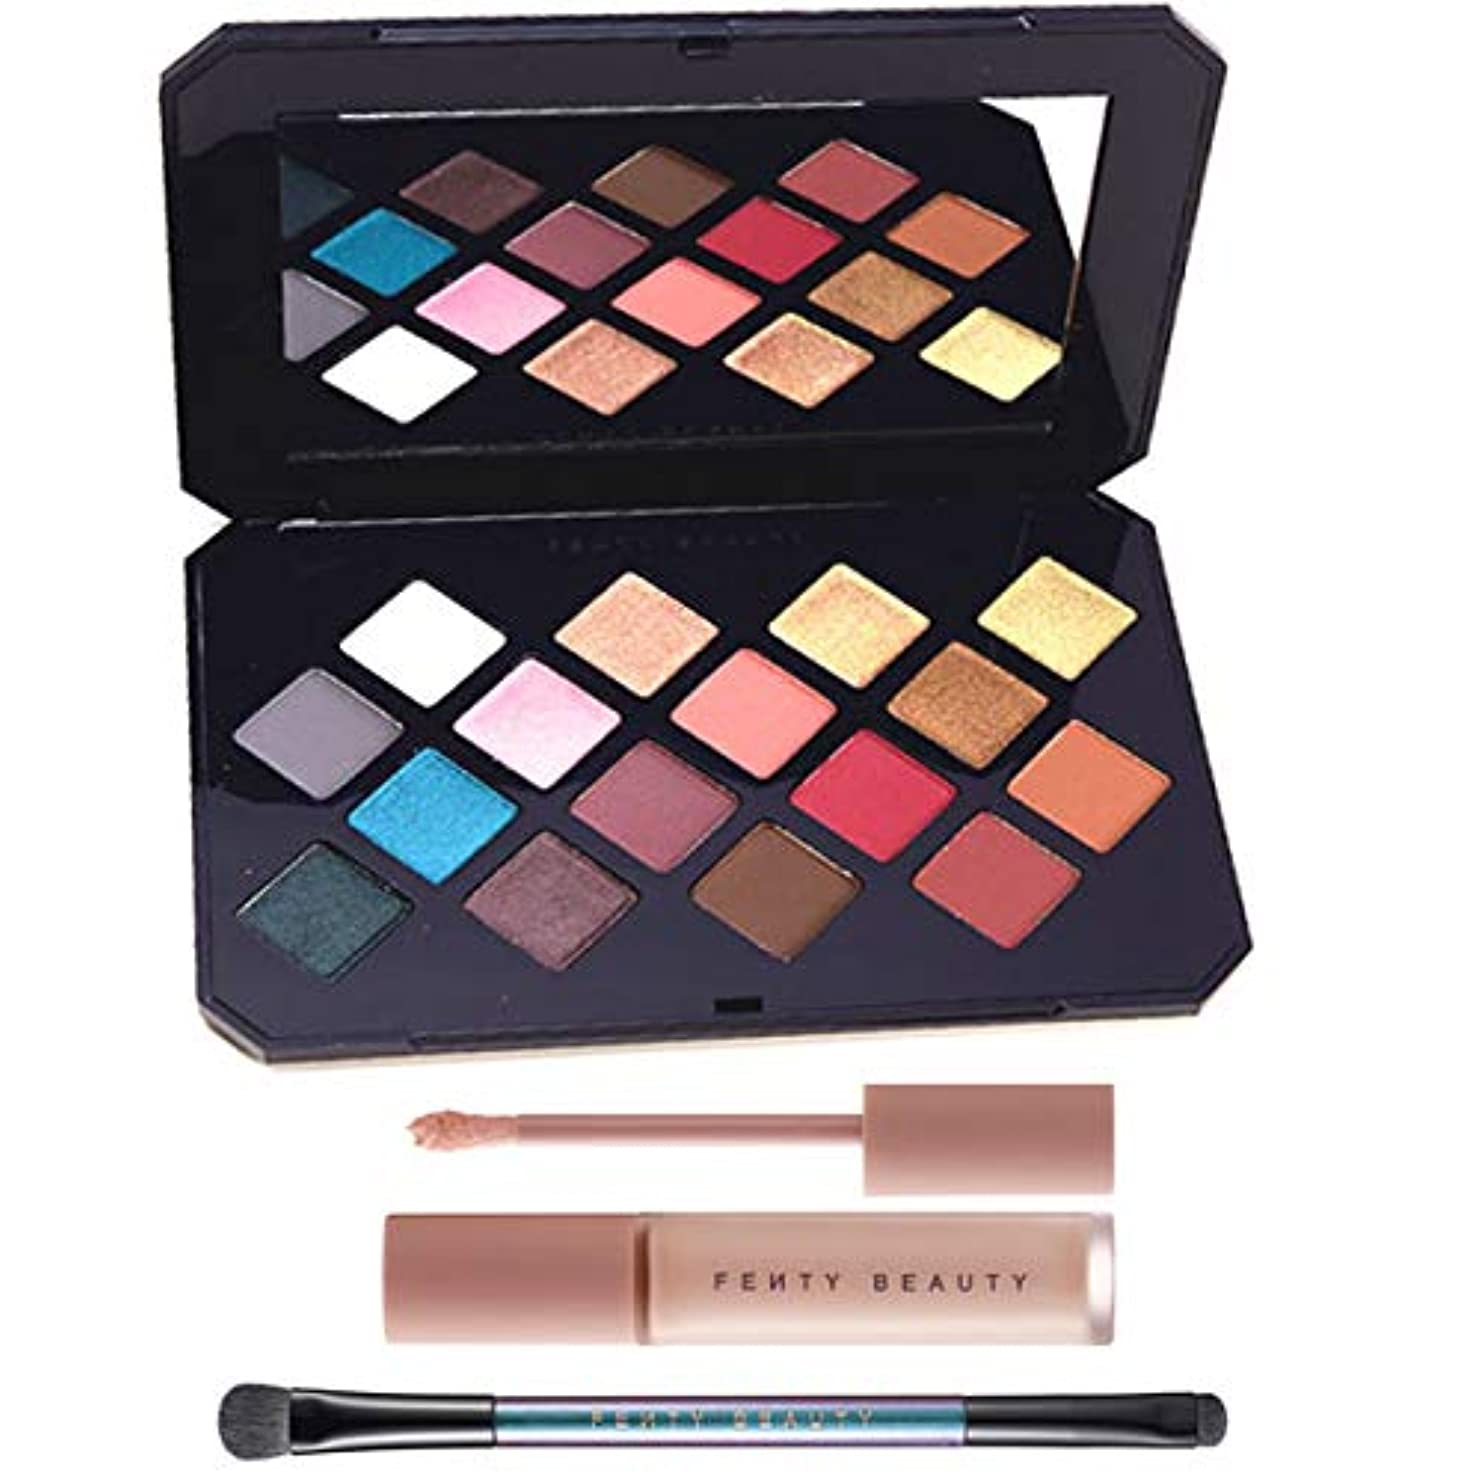 FENTY BEAUTY BY RIHANNA, Moroccan Spice Eyeshadow Palette & Eye Essentials [海外直送品] [並行輸入品]